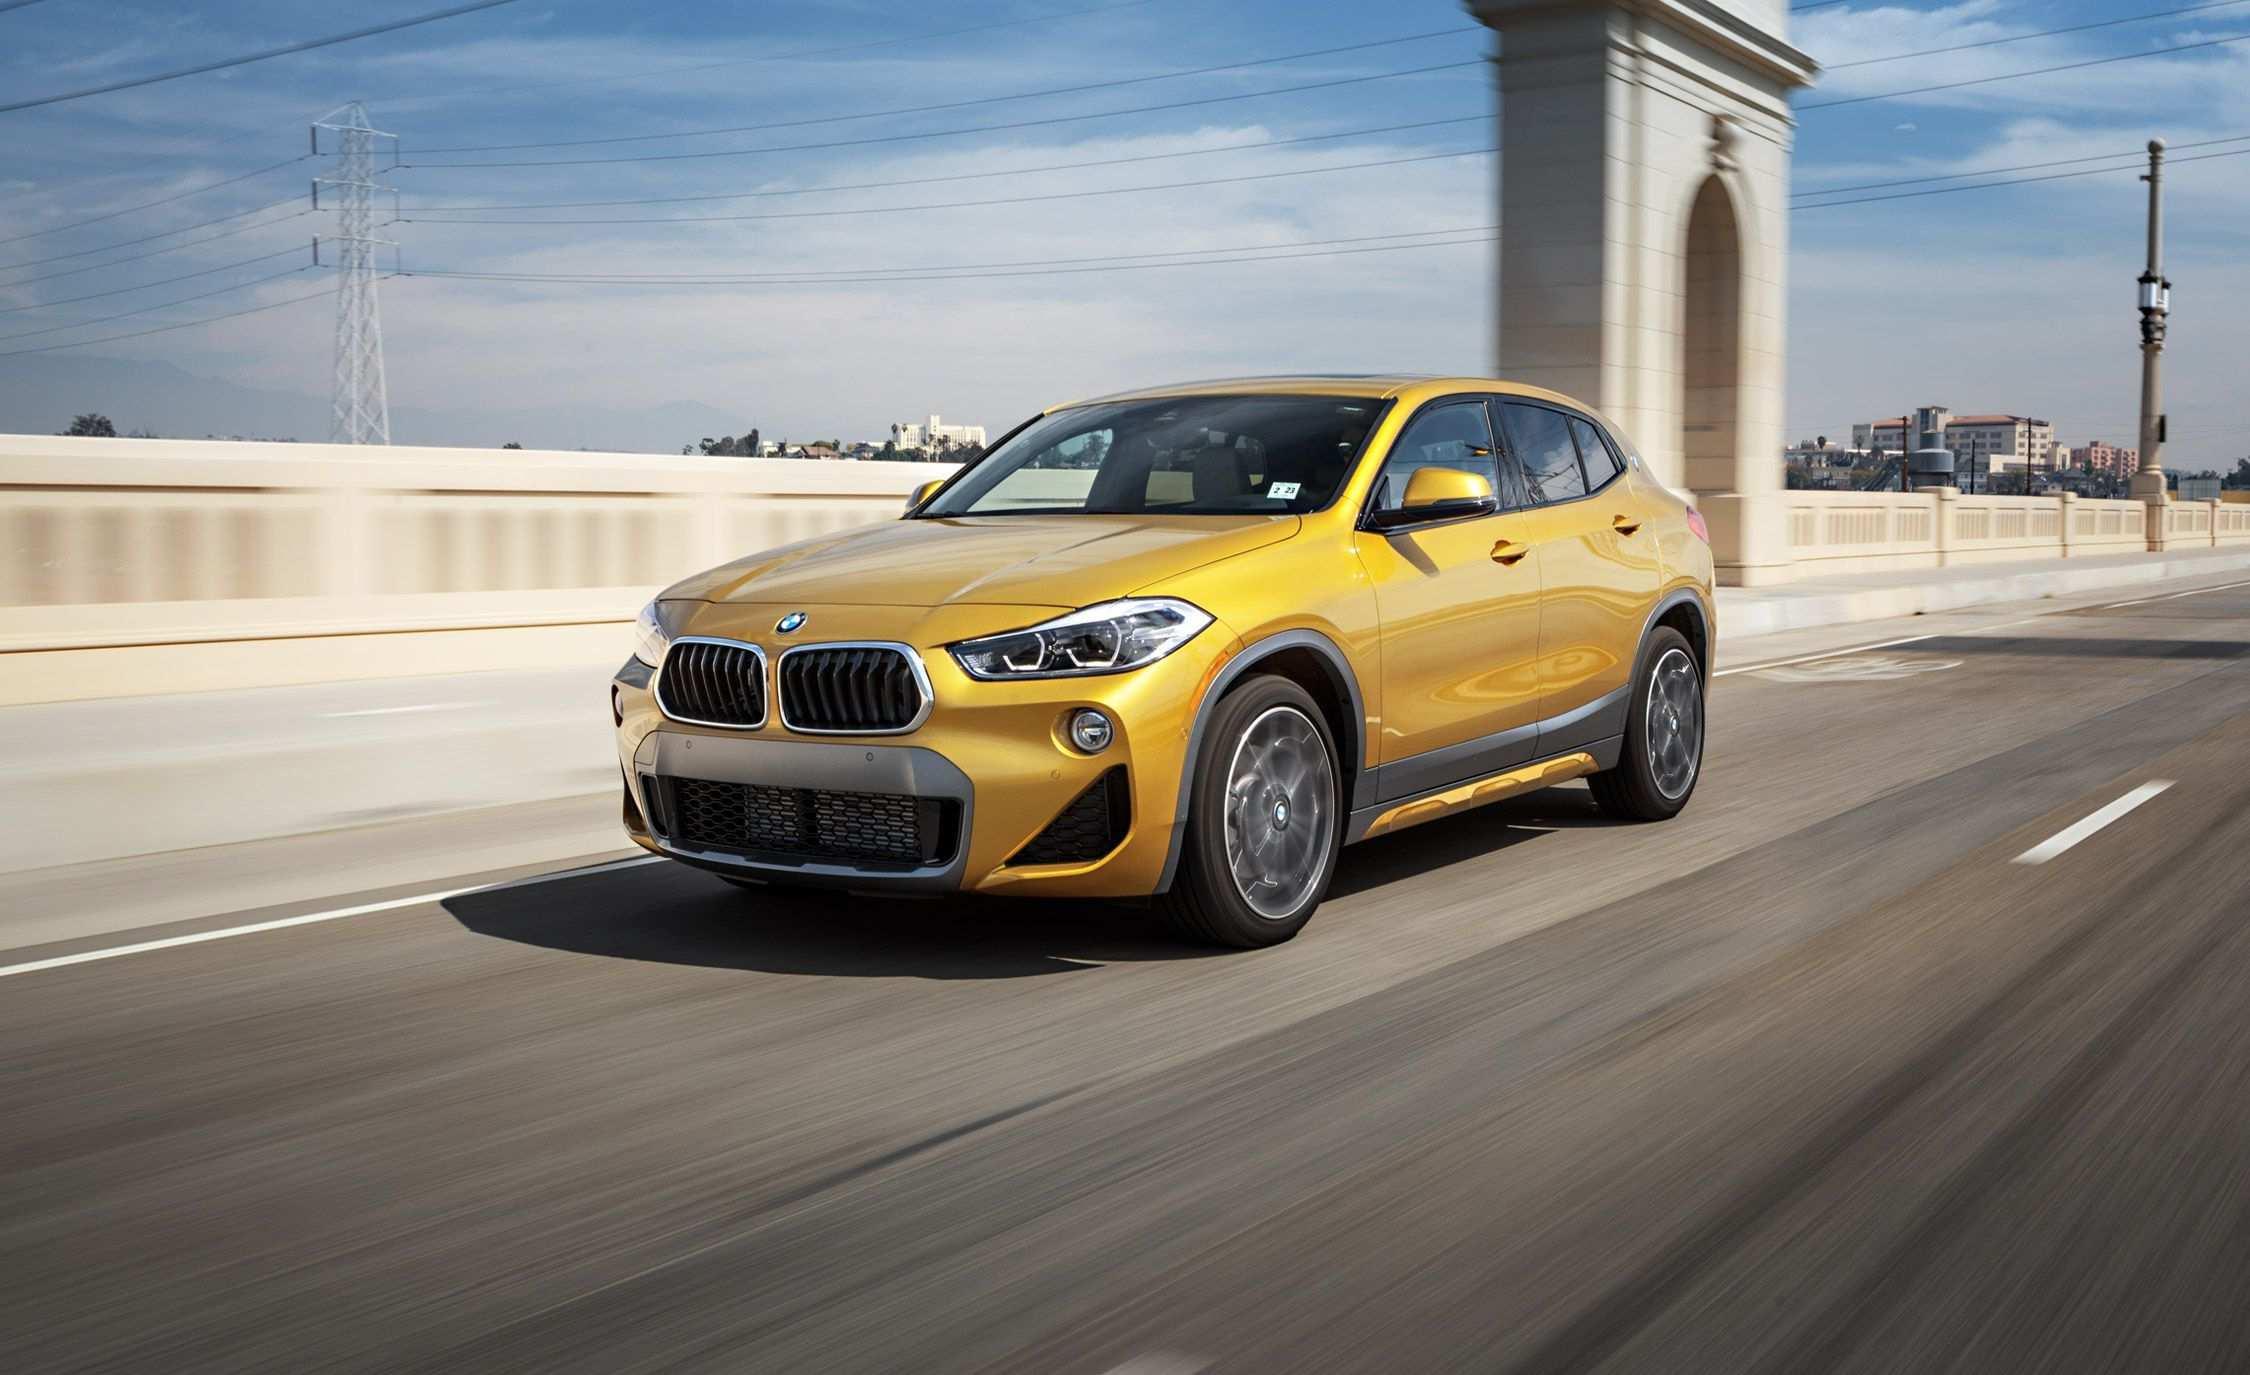 50 Gallery of 2020 BMW Sierra Gas Mileage Performance and New Engine by 2020 BMW Sierra Gas Mileage